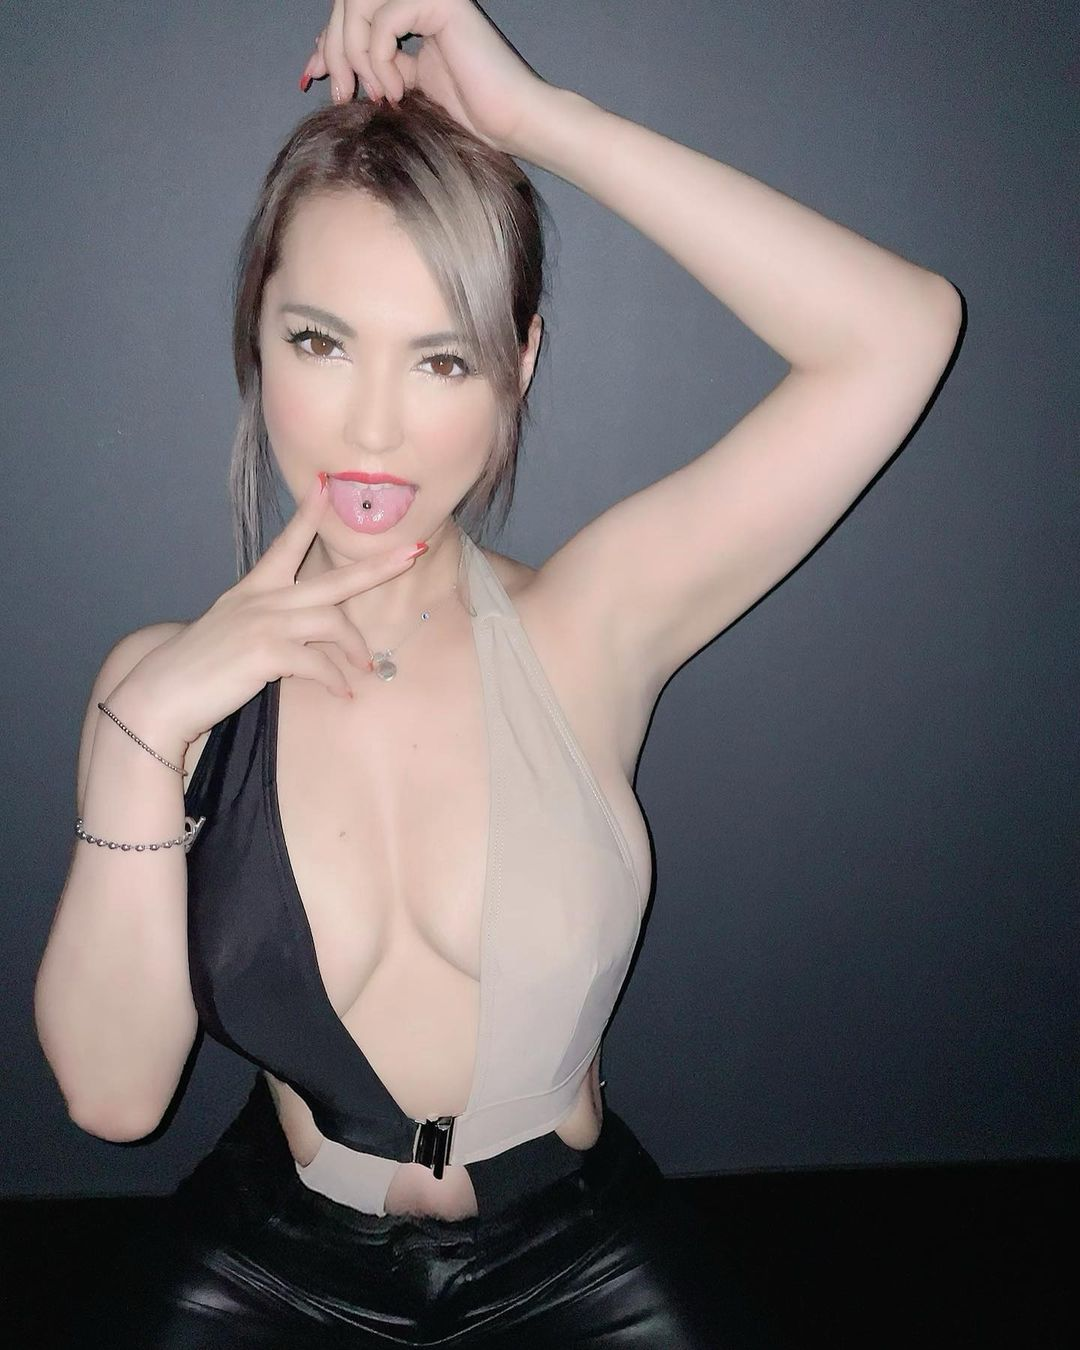 Dulu Buka-bukaan, Begini Potret Terbaru Maria Ozawa Si Bintang Porno